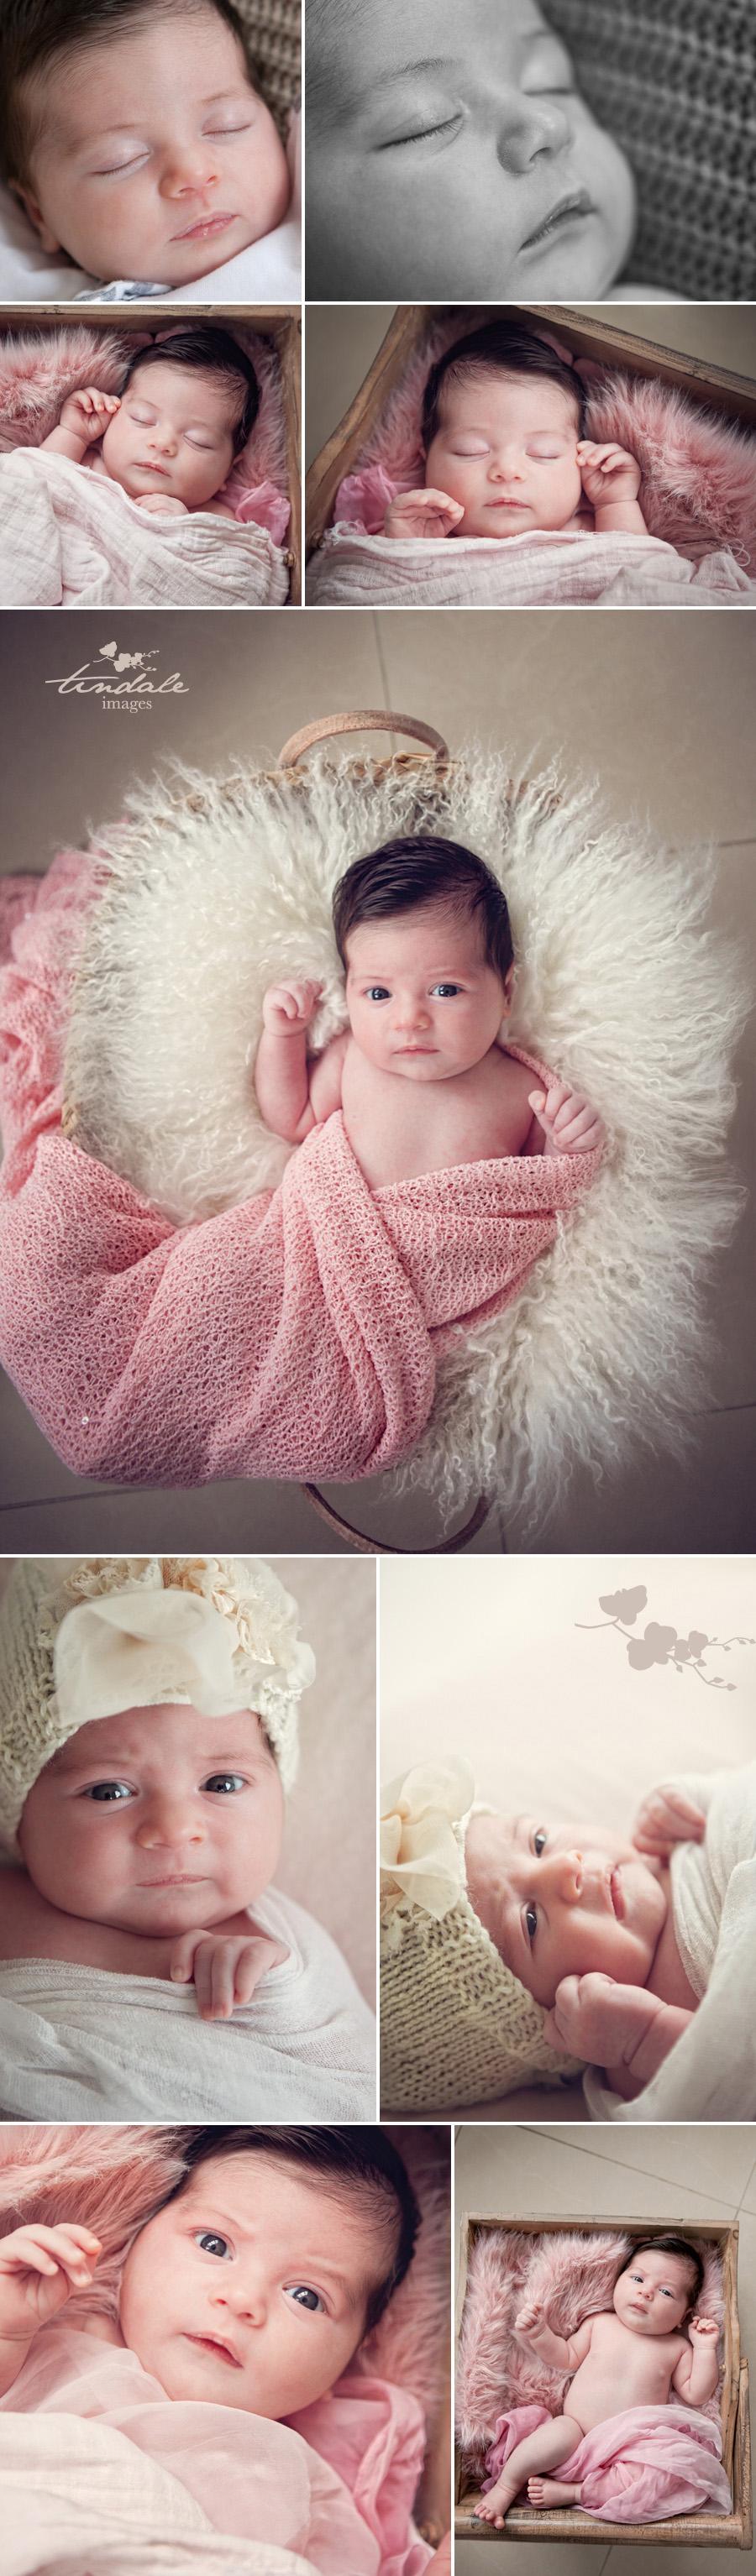 daddy's little girl - sutherland shire newborn photographer